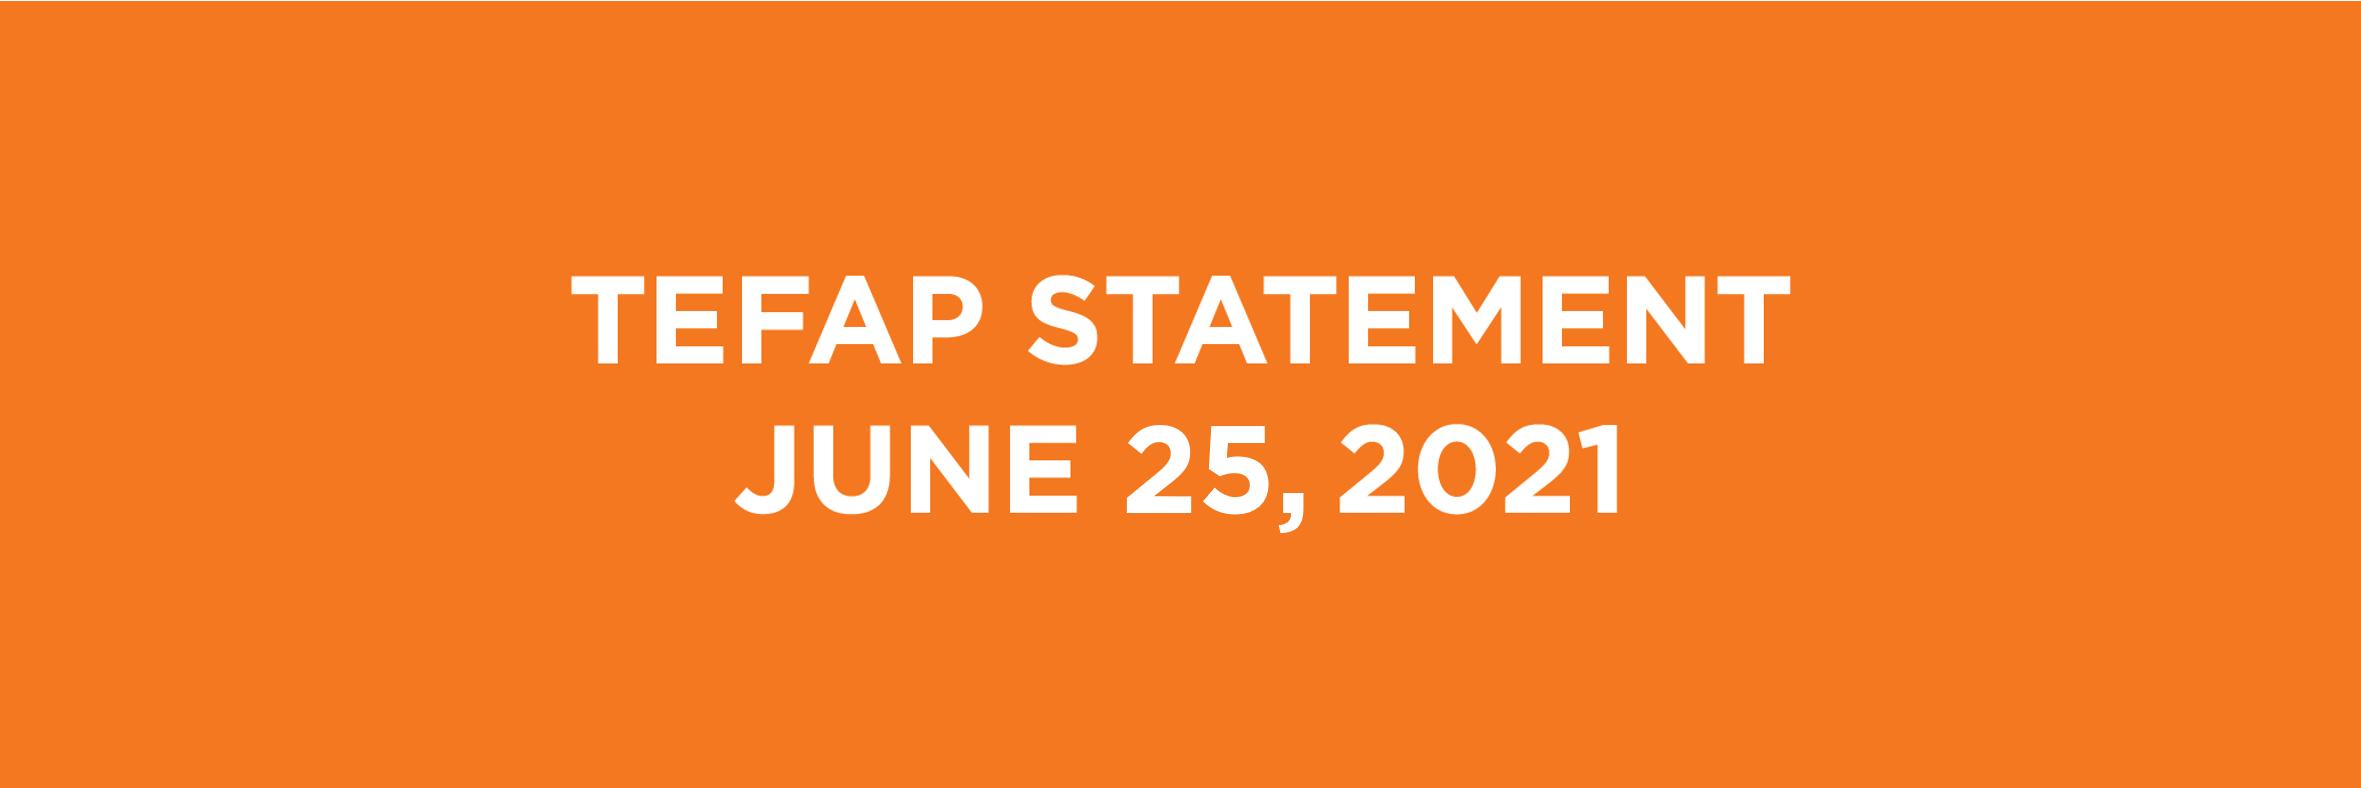 Feeding South Florida's TEFAP Statement | June 25, 2021